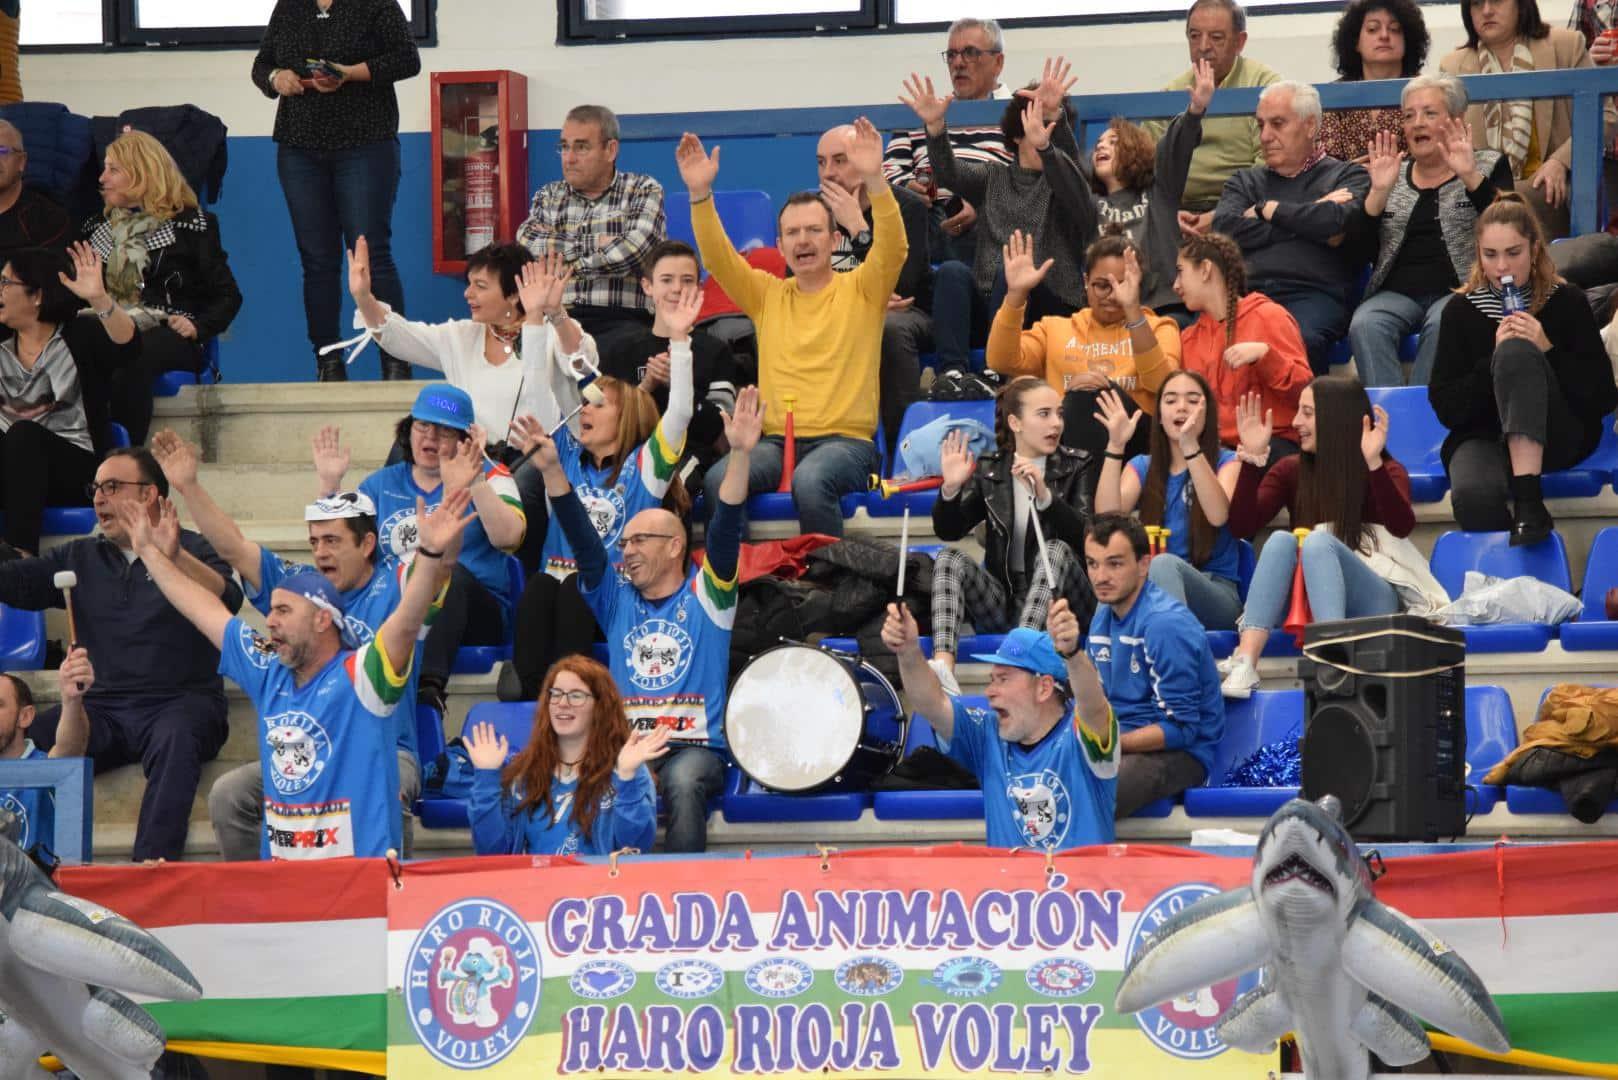 Un aguerrido OSACC Haro cae ante Menorca en un apasionante partido 2